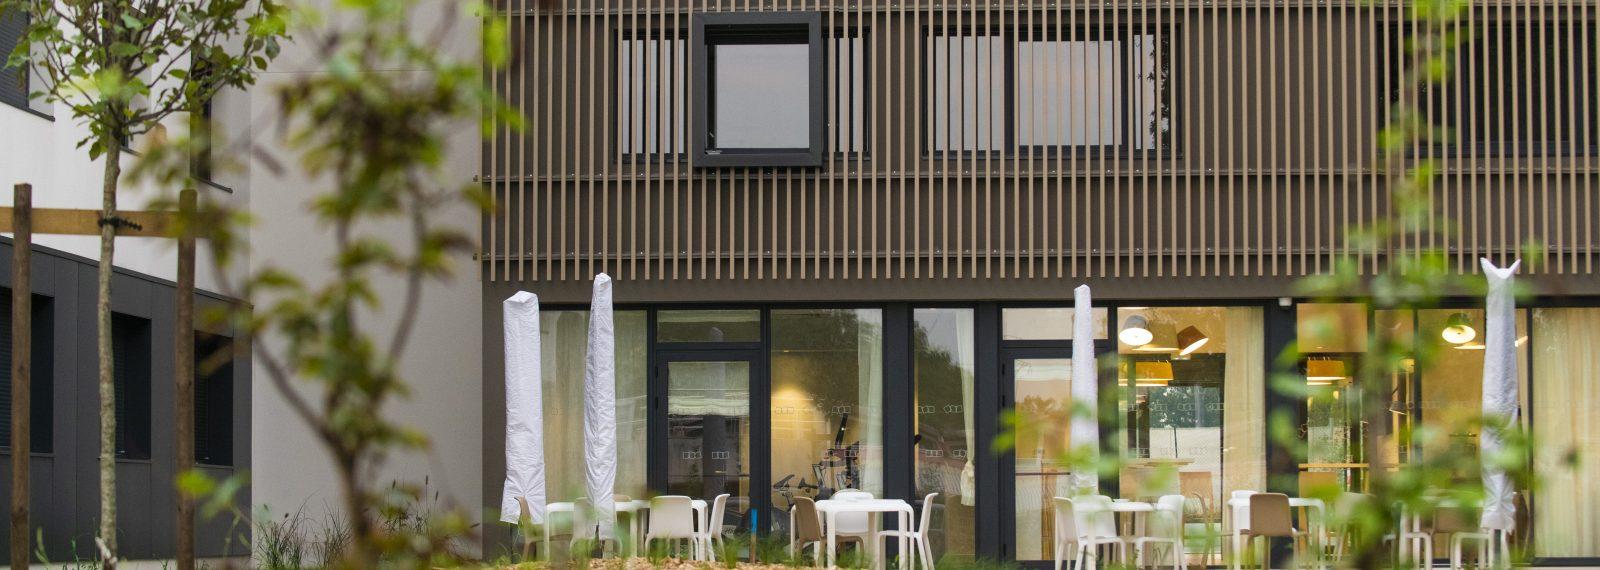 appart hotel bordeaux enight r sidence h teli re. Black Bedroom Furniture Sets. Home Design Ideas